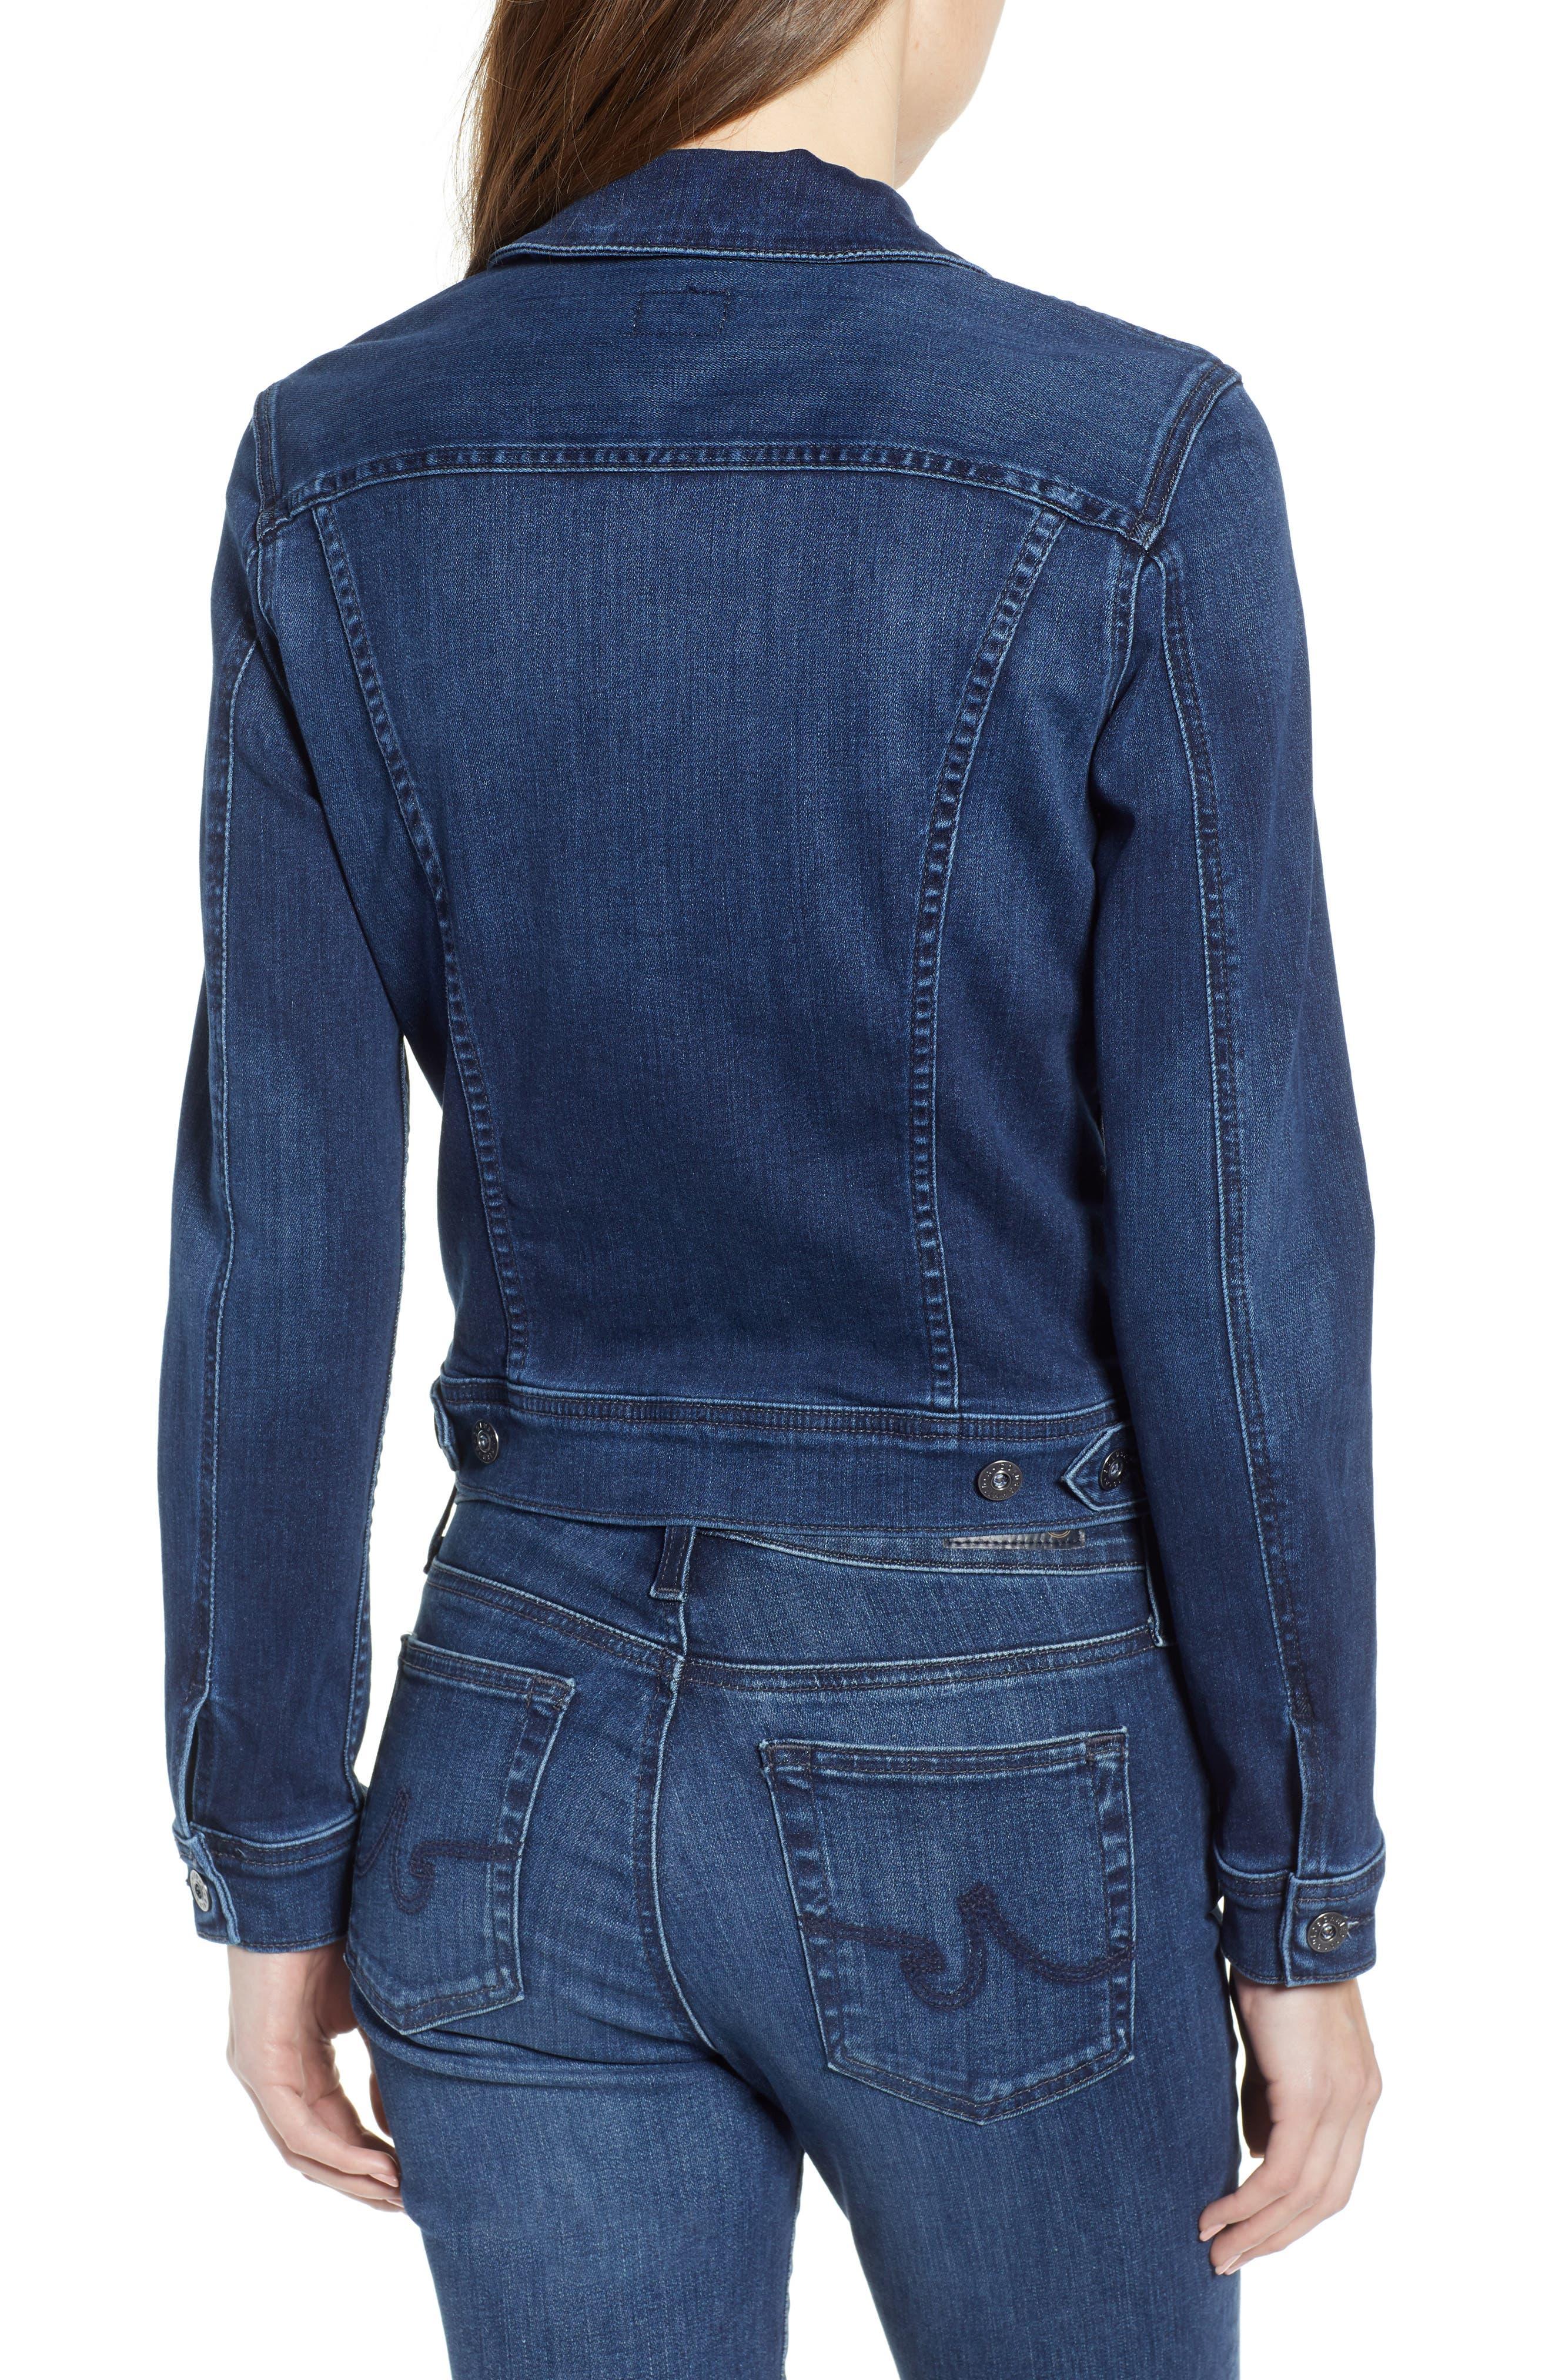 Robyn Crop Denim Jacket,                             Alternate thumbnail 2, color,                             PINNACLE BLUE